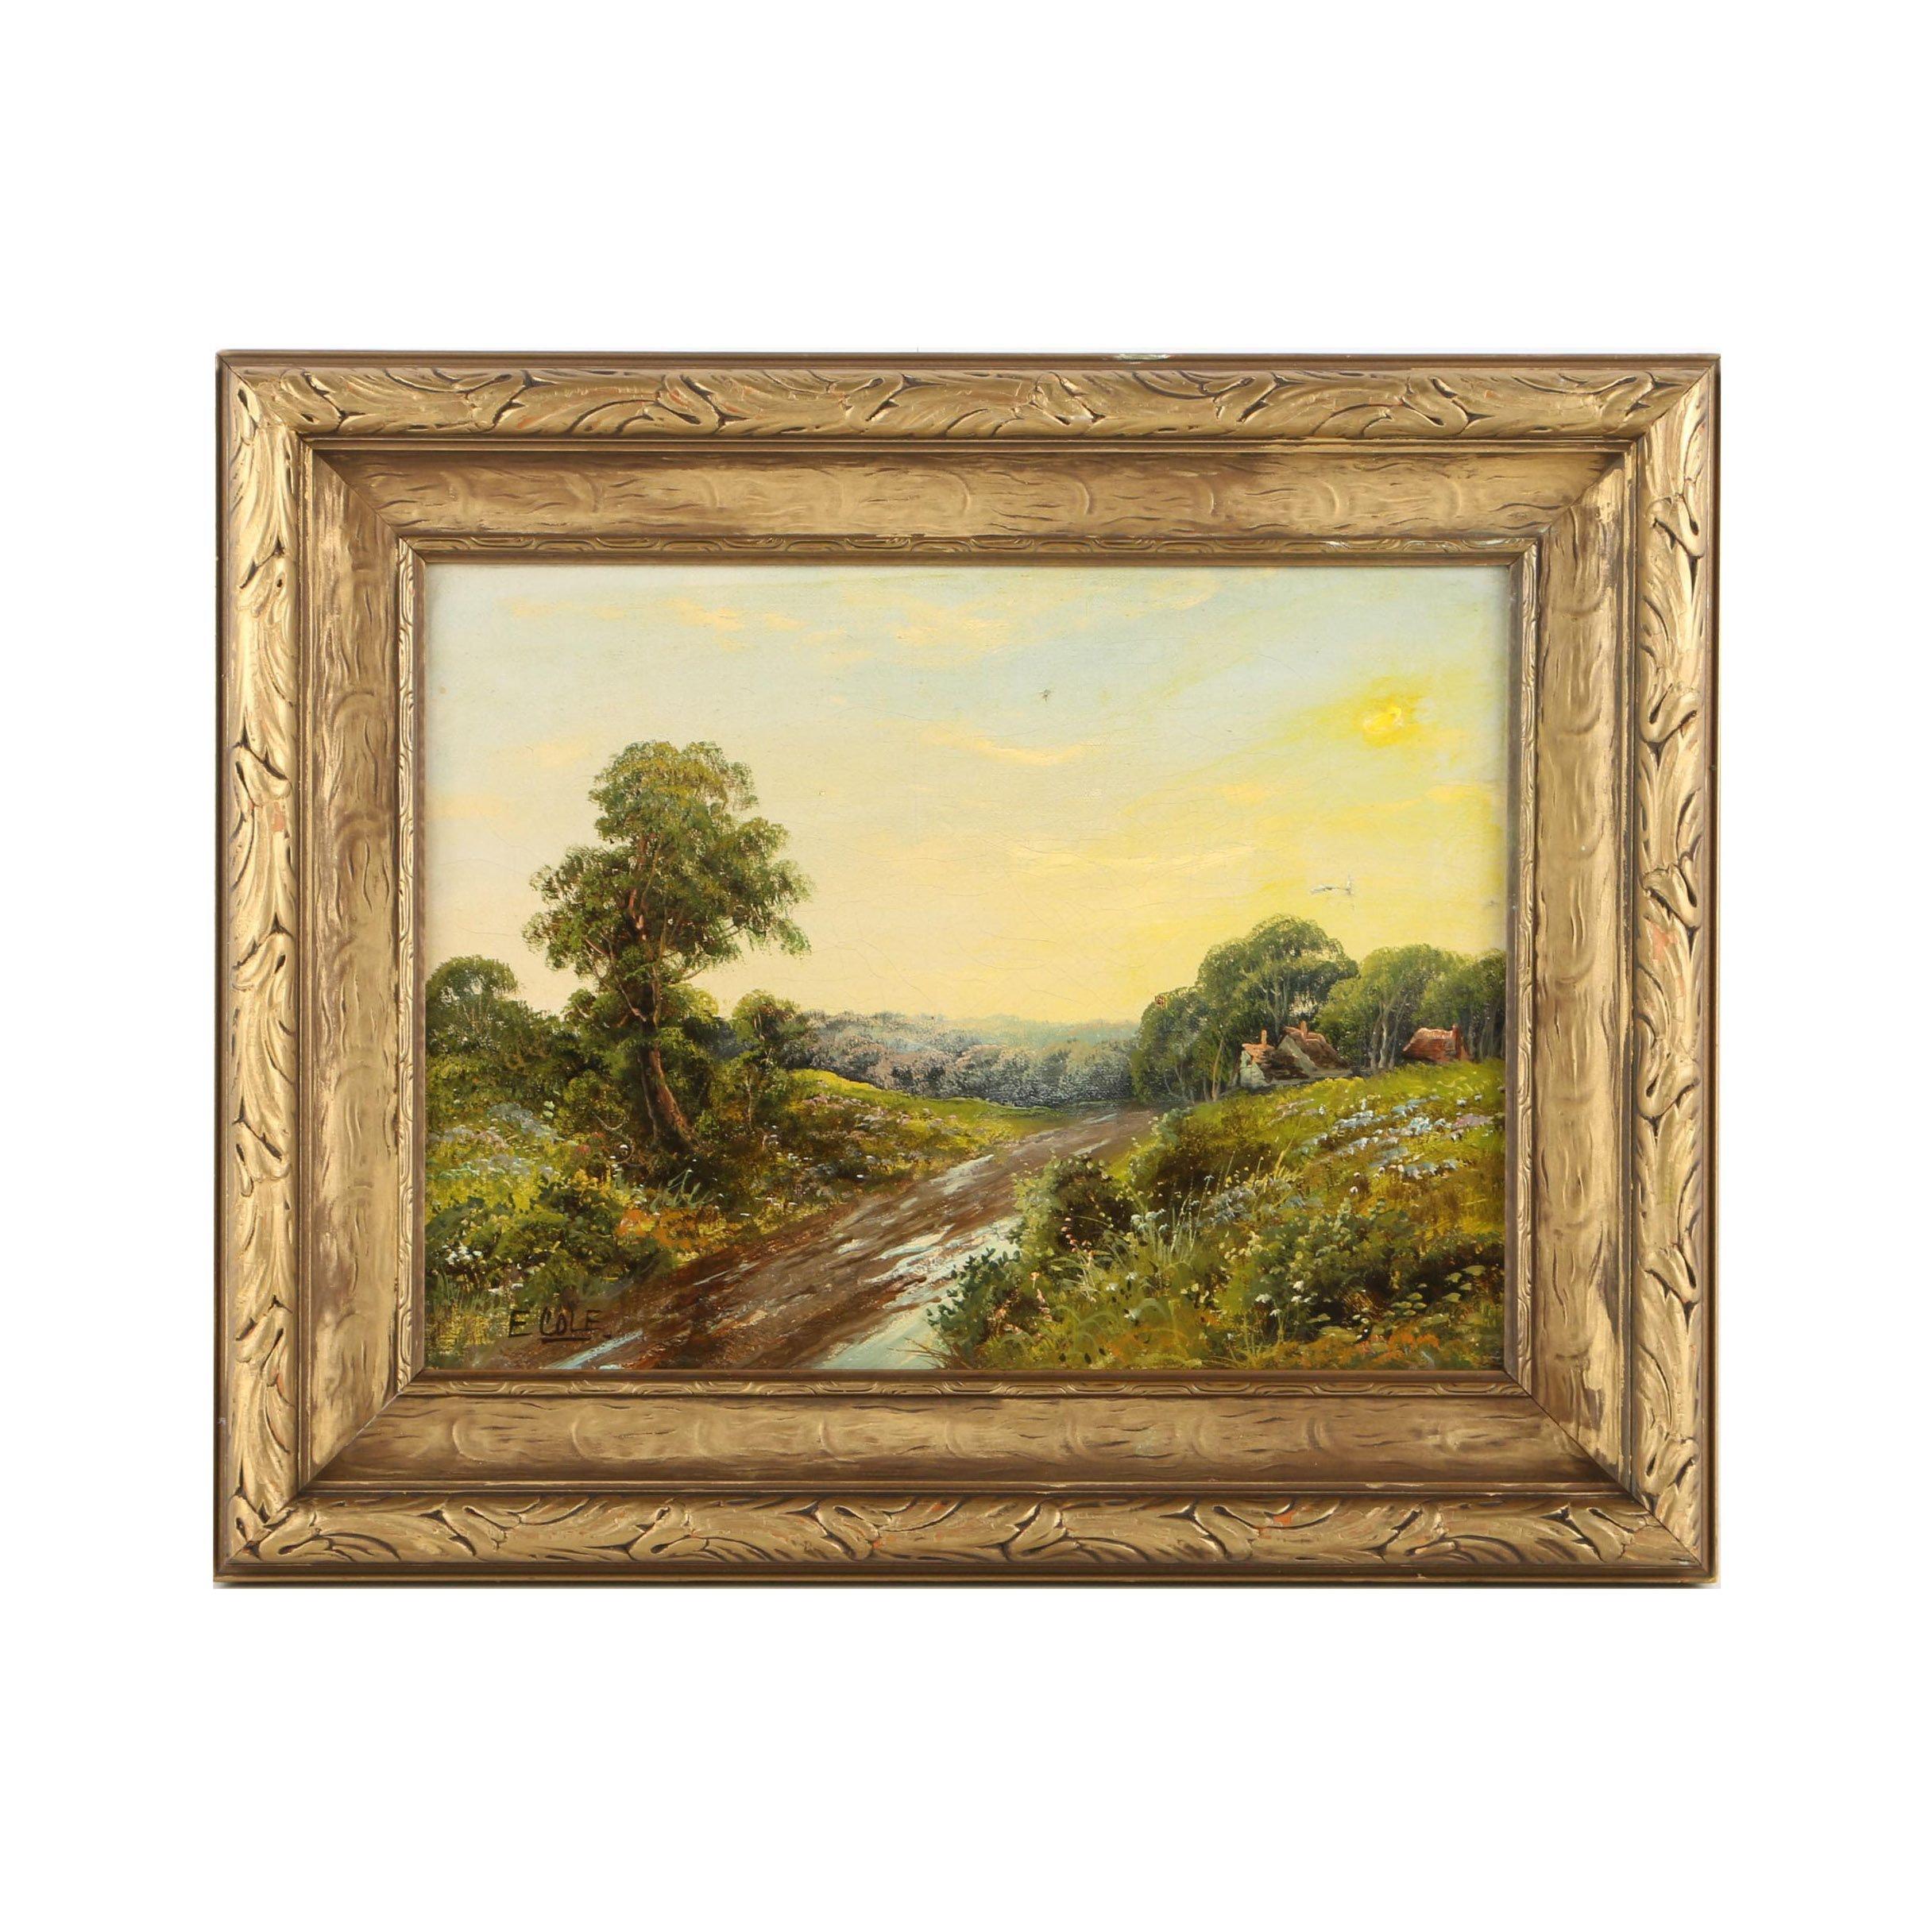 Edwin Cole Oil Painting on Canvas of Pastoral Landscape